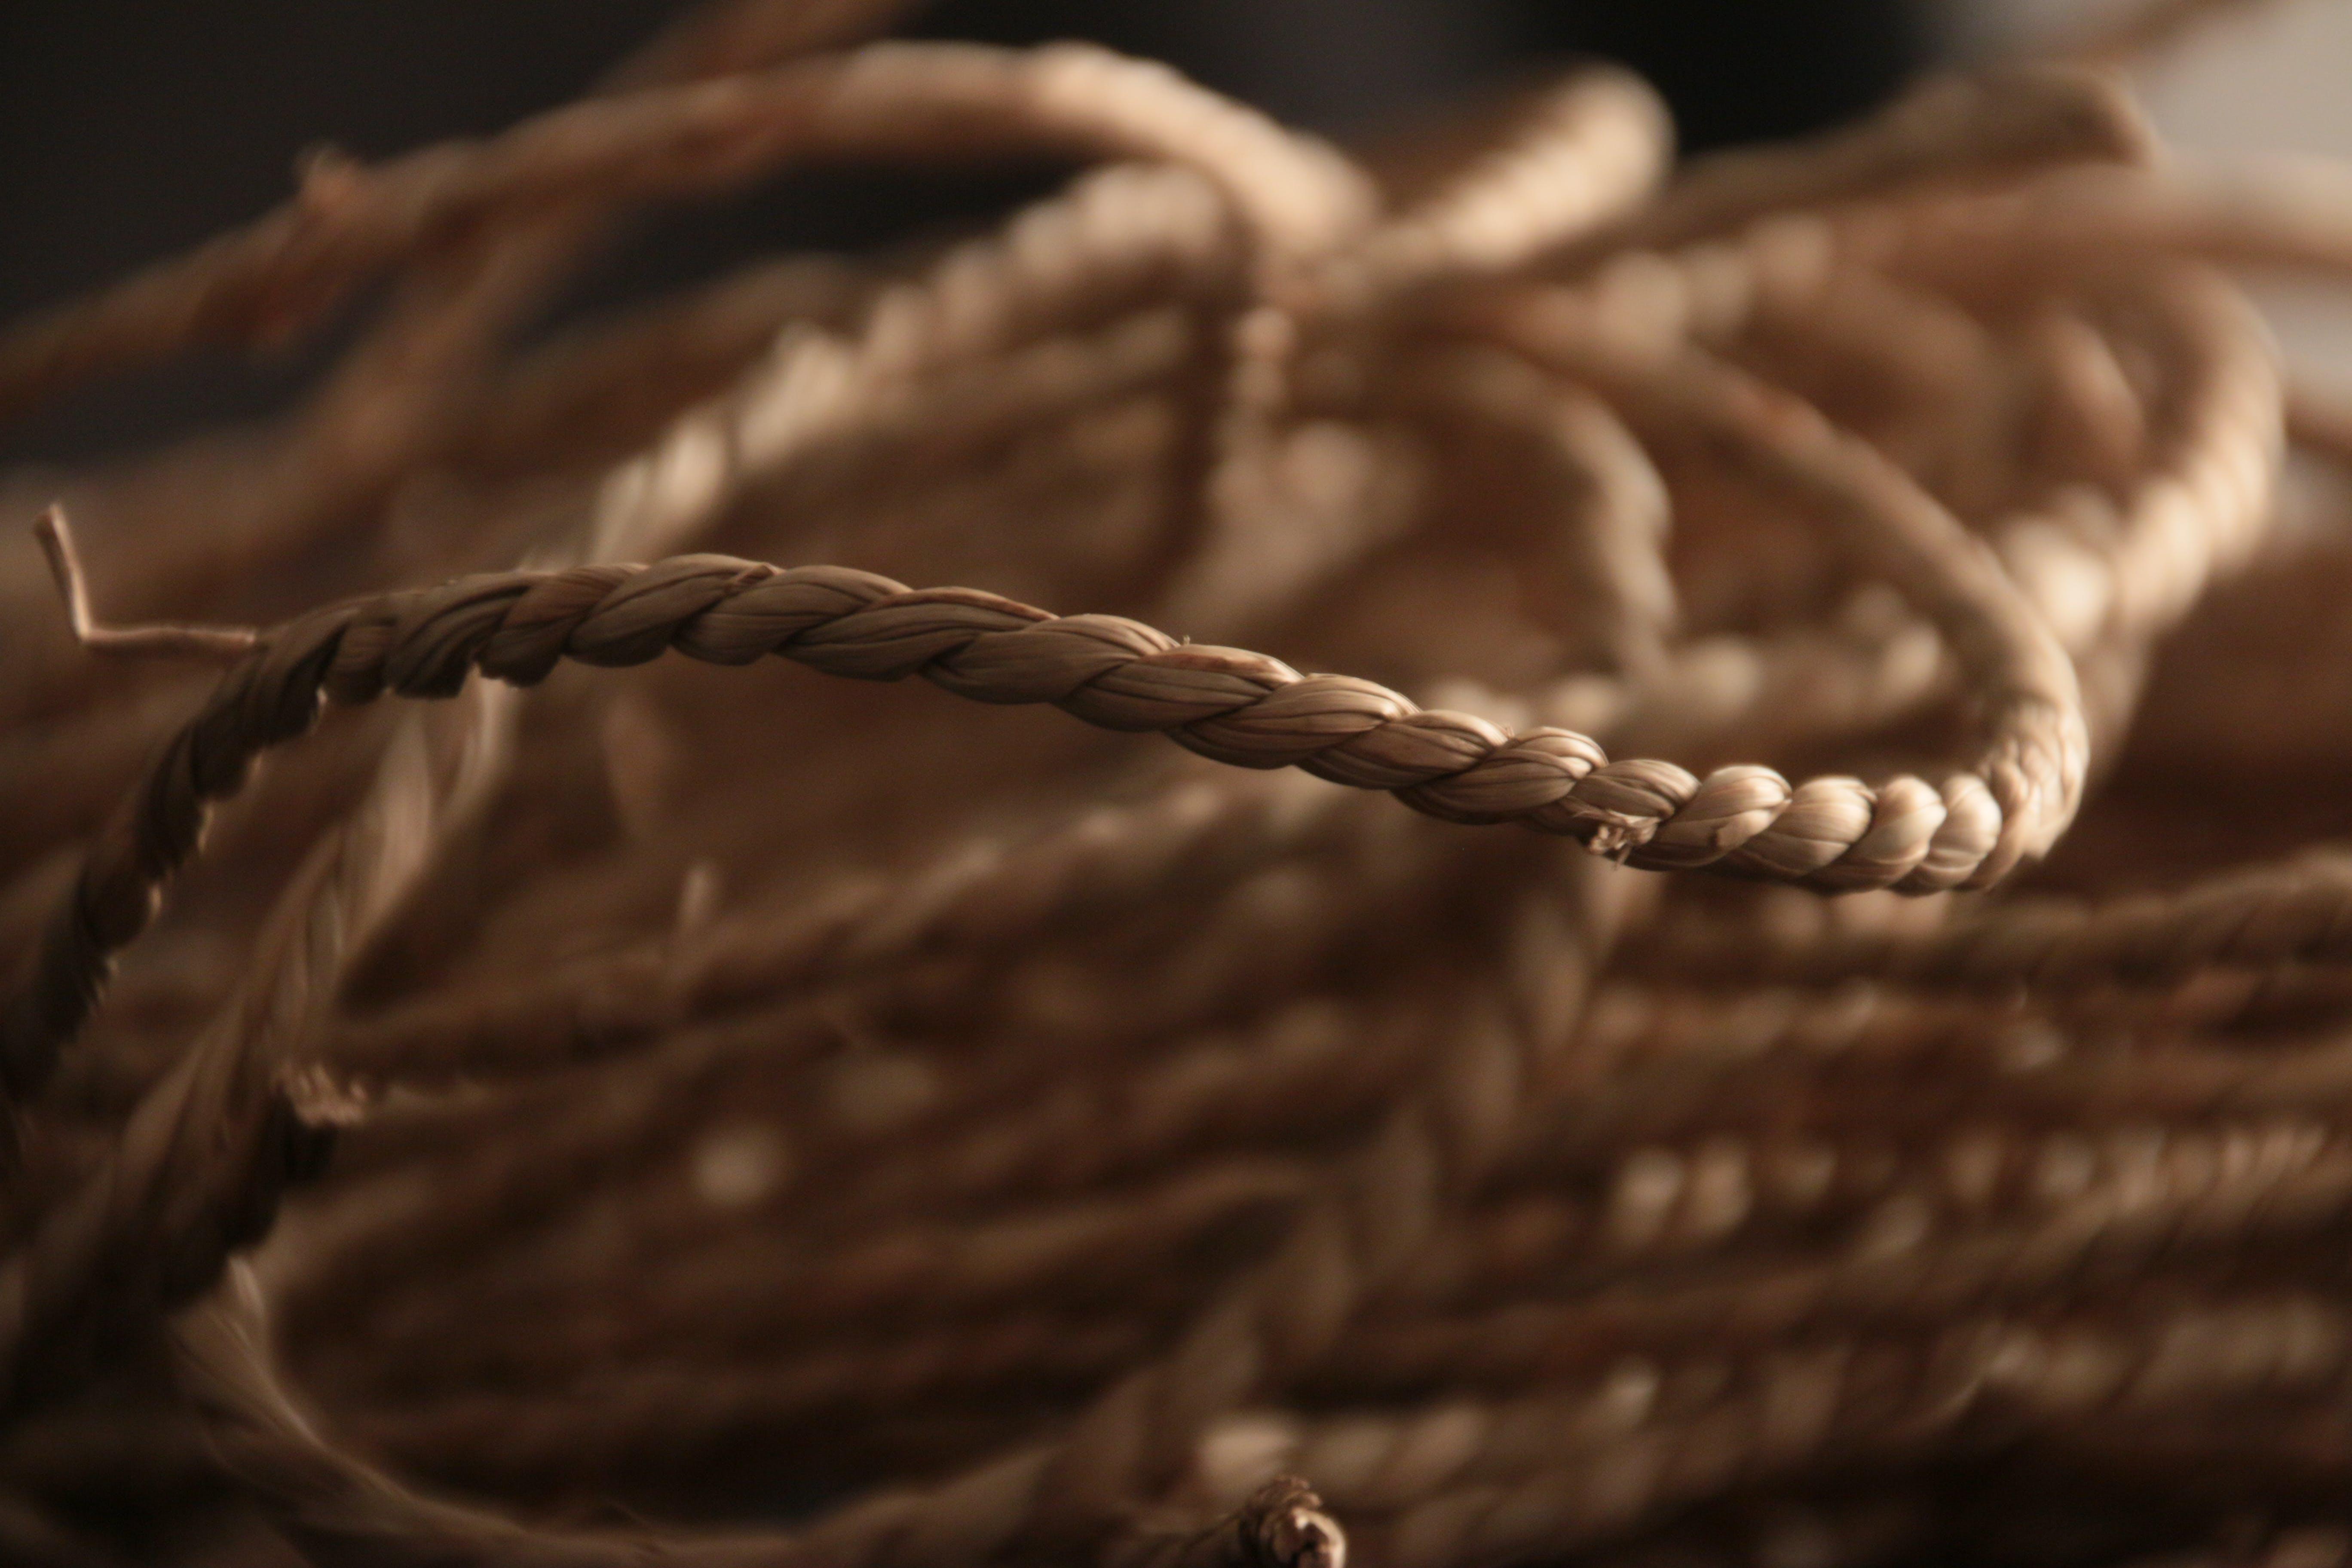 blur, close-up, cord